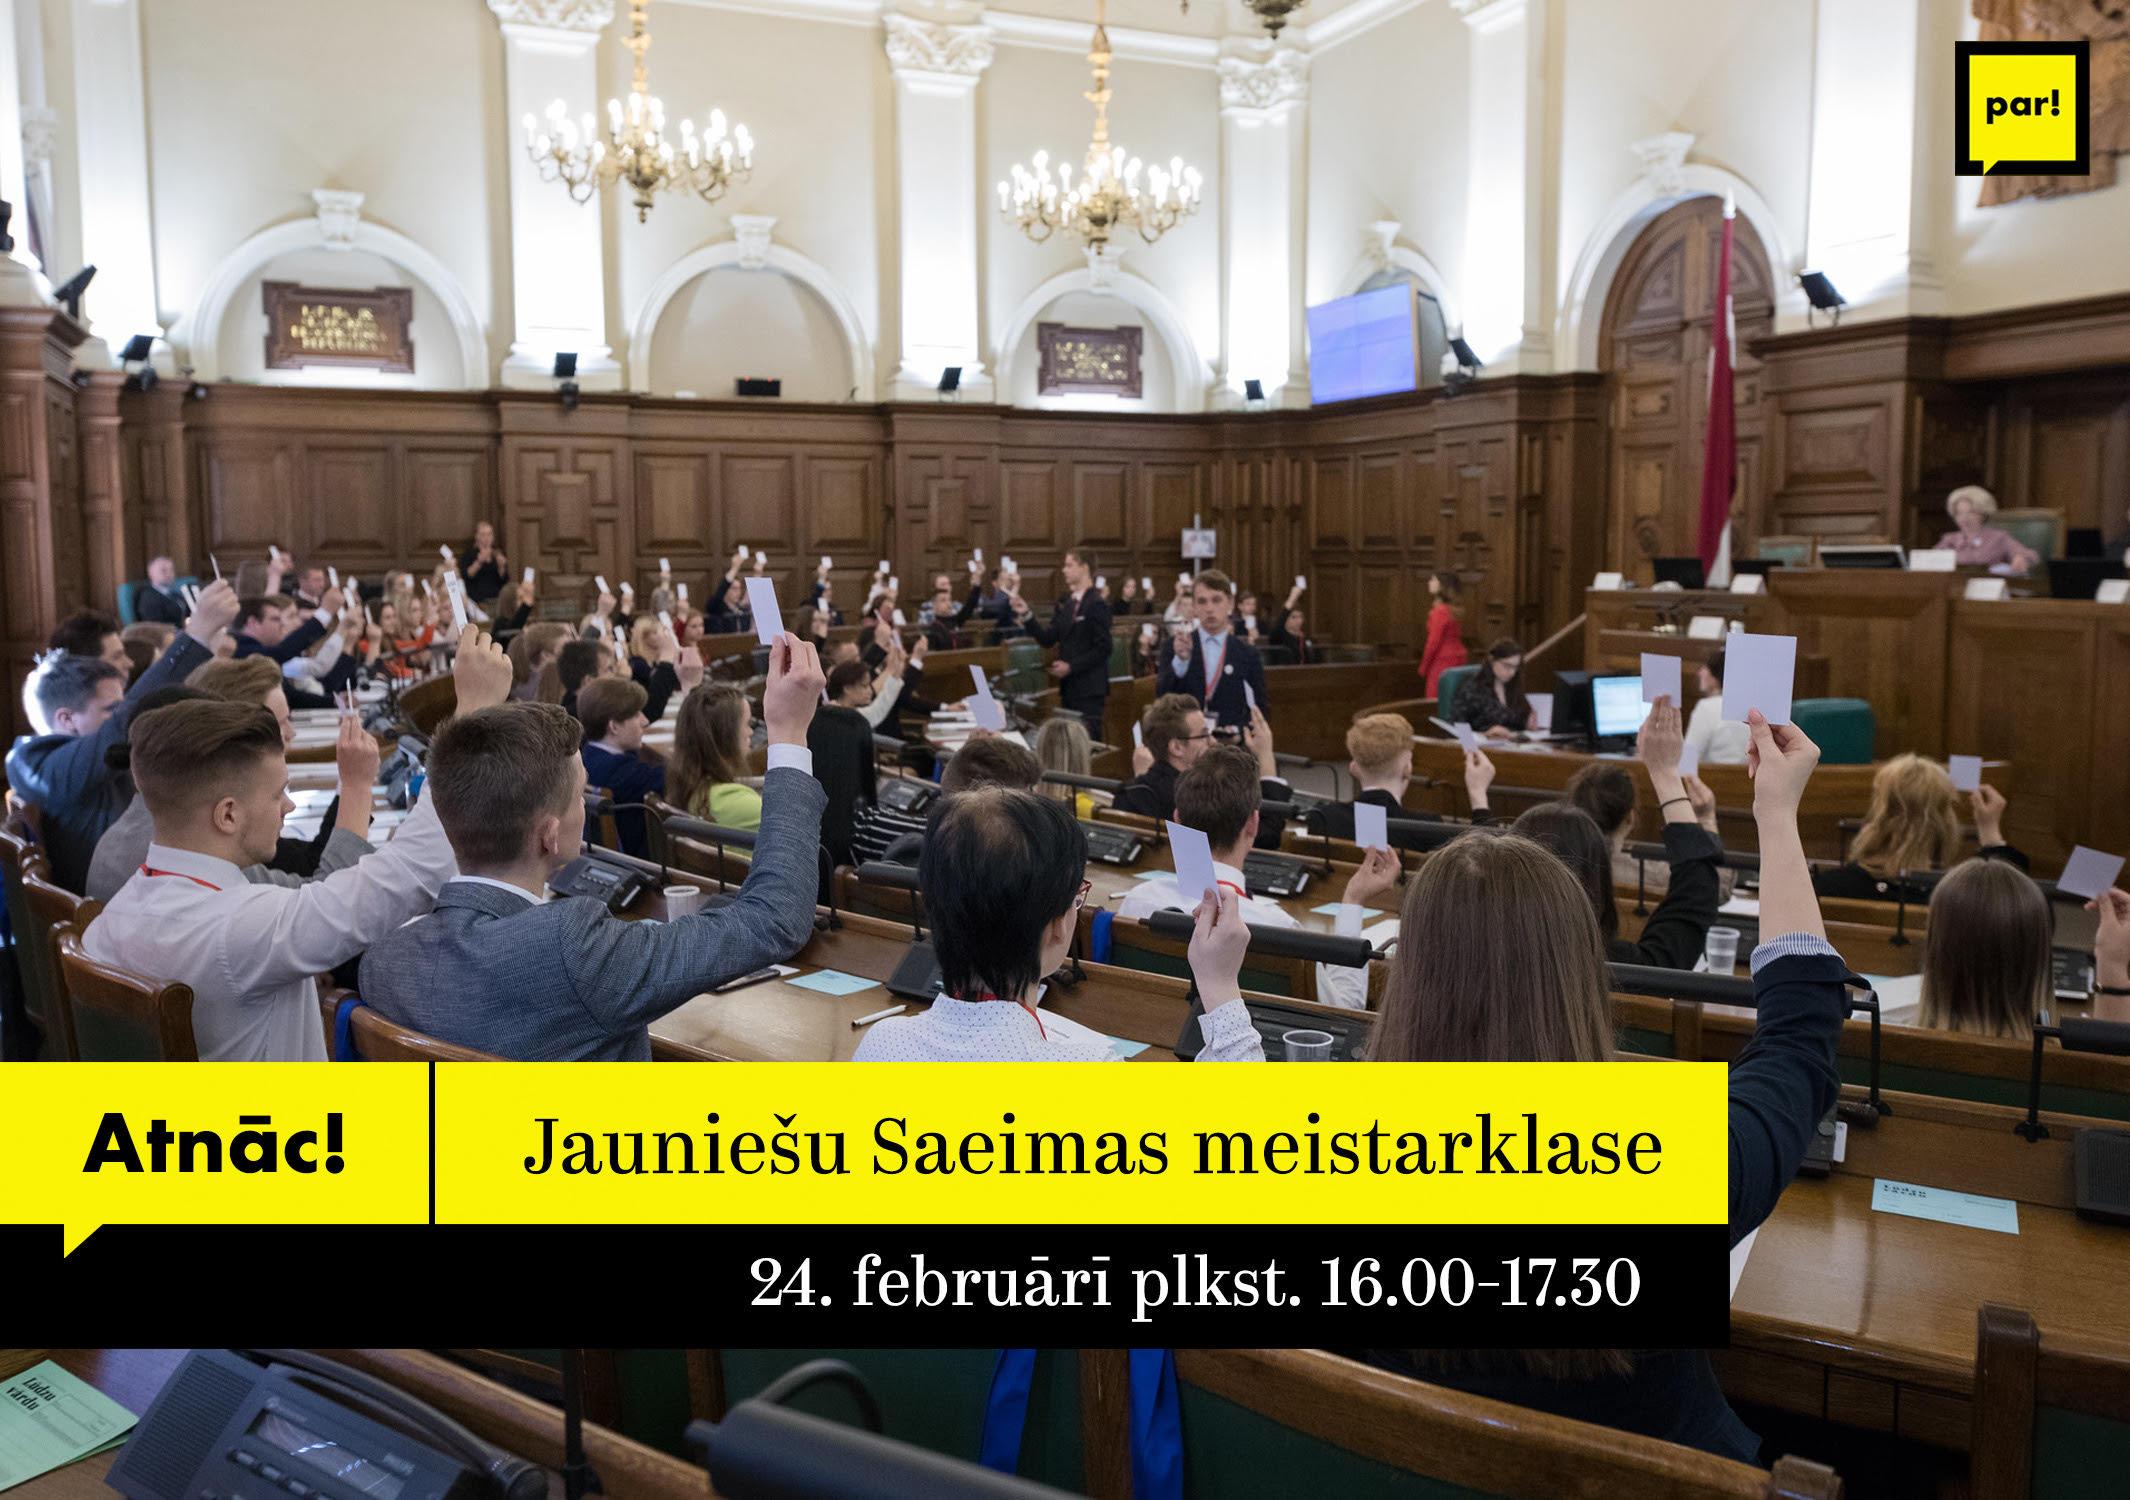 Jauniešu Saeimas meistarklase 24.02.